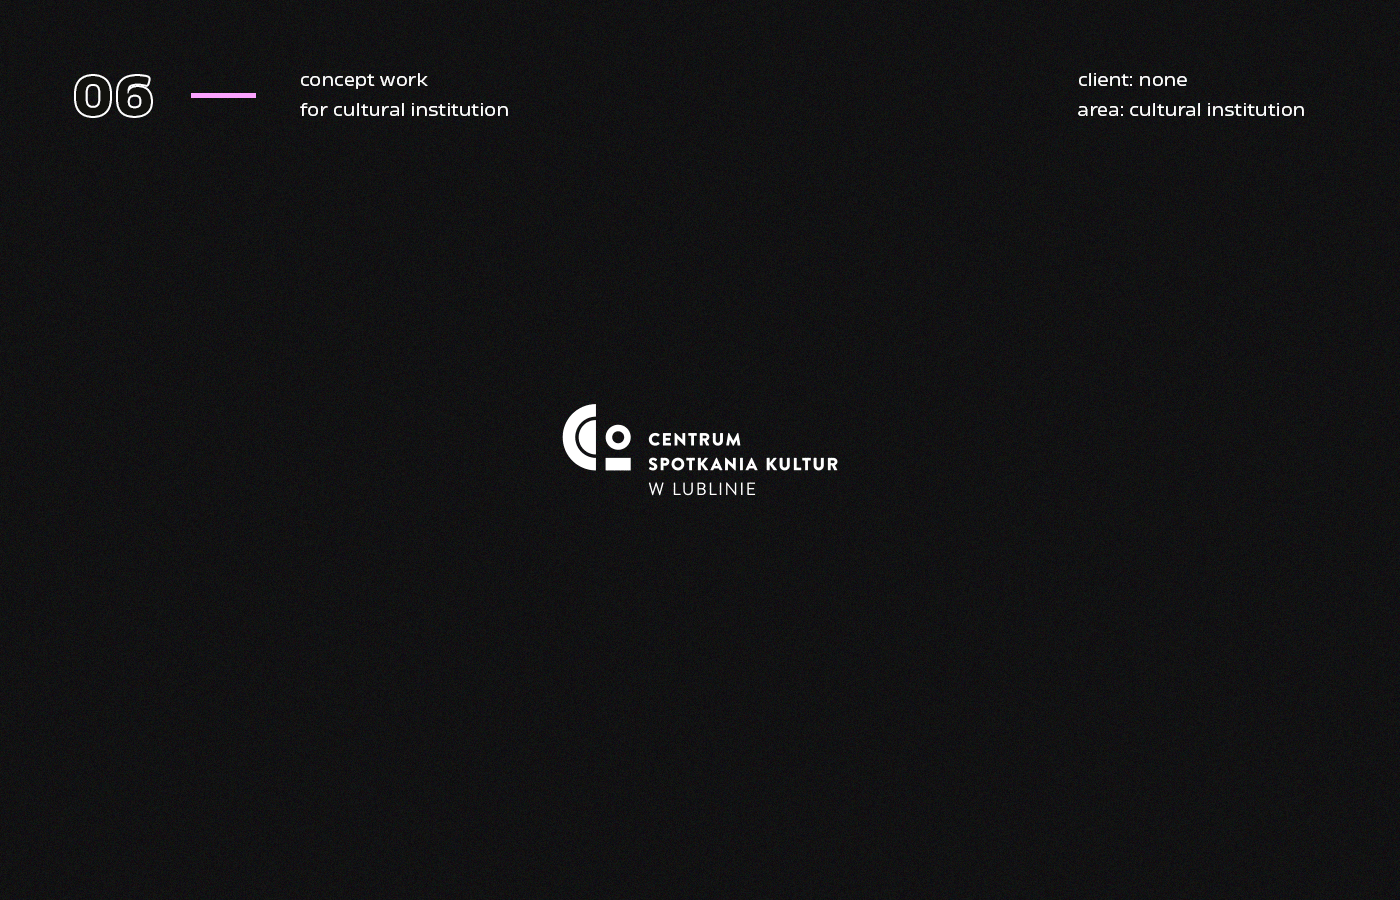 logodesign logofolio logofolio 2019 logo developer logo Brand Design brand identity branding  graphic design